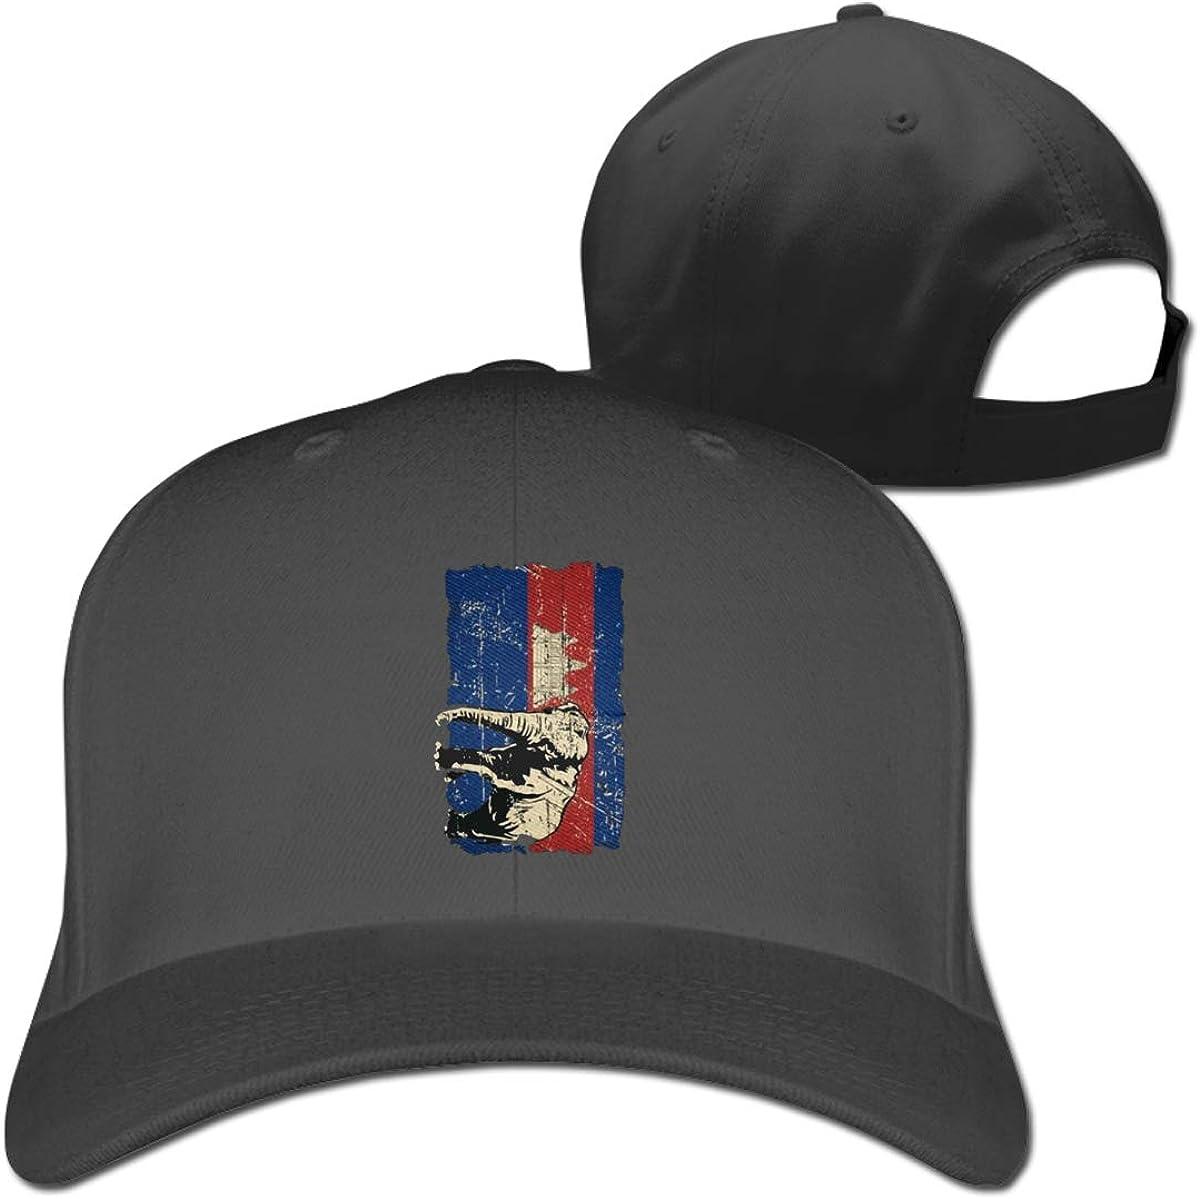 Cambodia Flag Elephant Fashion Adjustable Cotton Baseball Caps Trucker Driver Hat Outdoor Cap Black